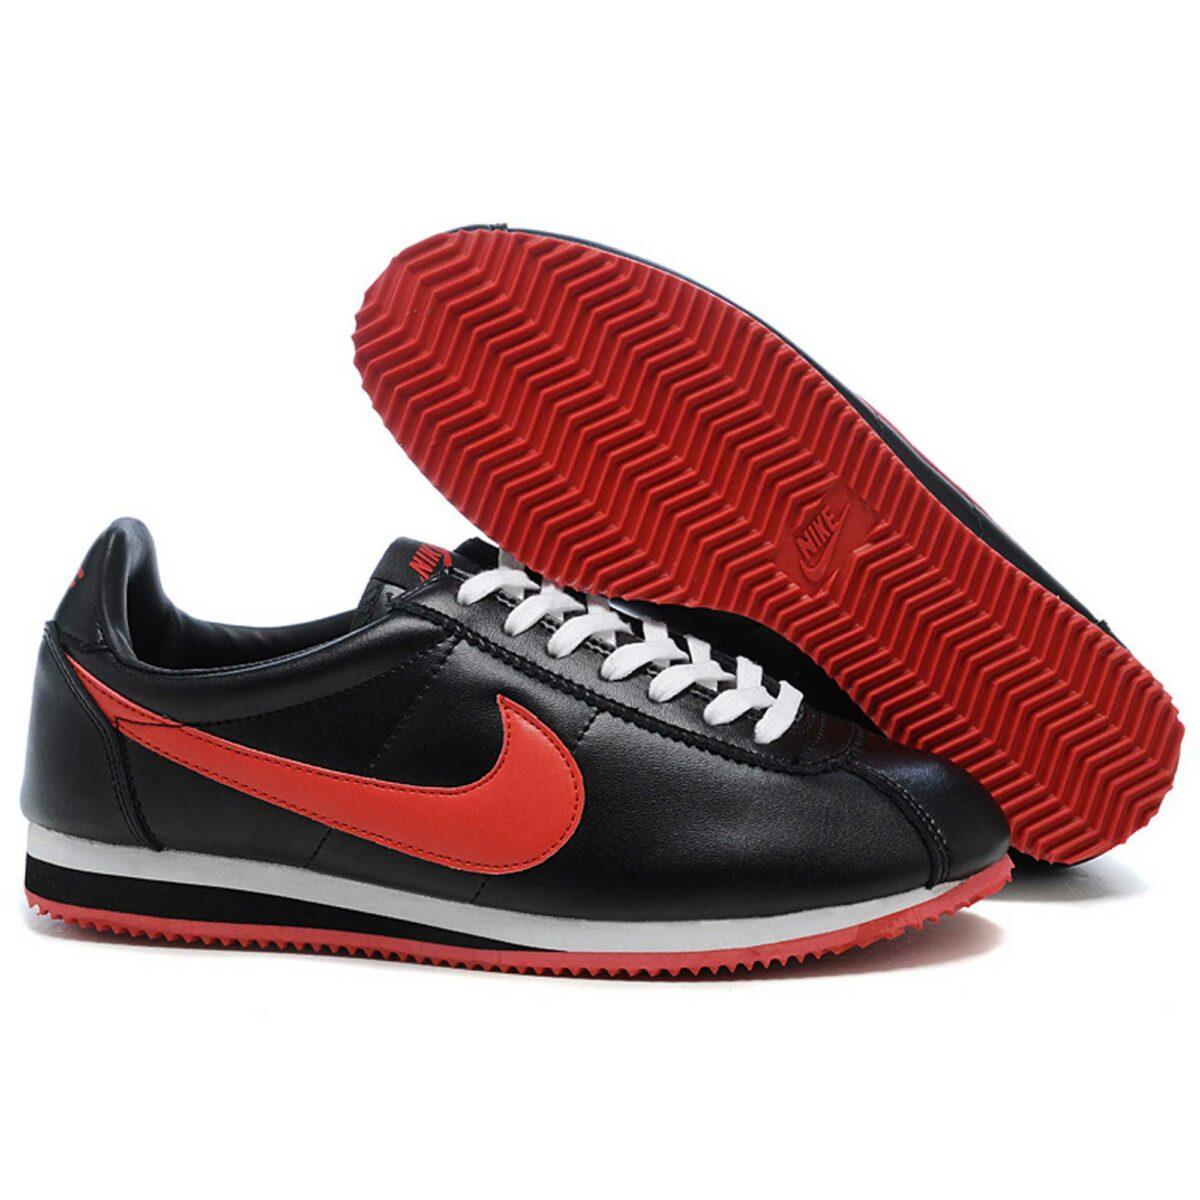 nike cortez leather black red white 349026_011 купить